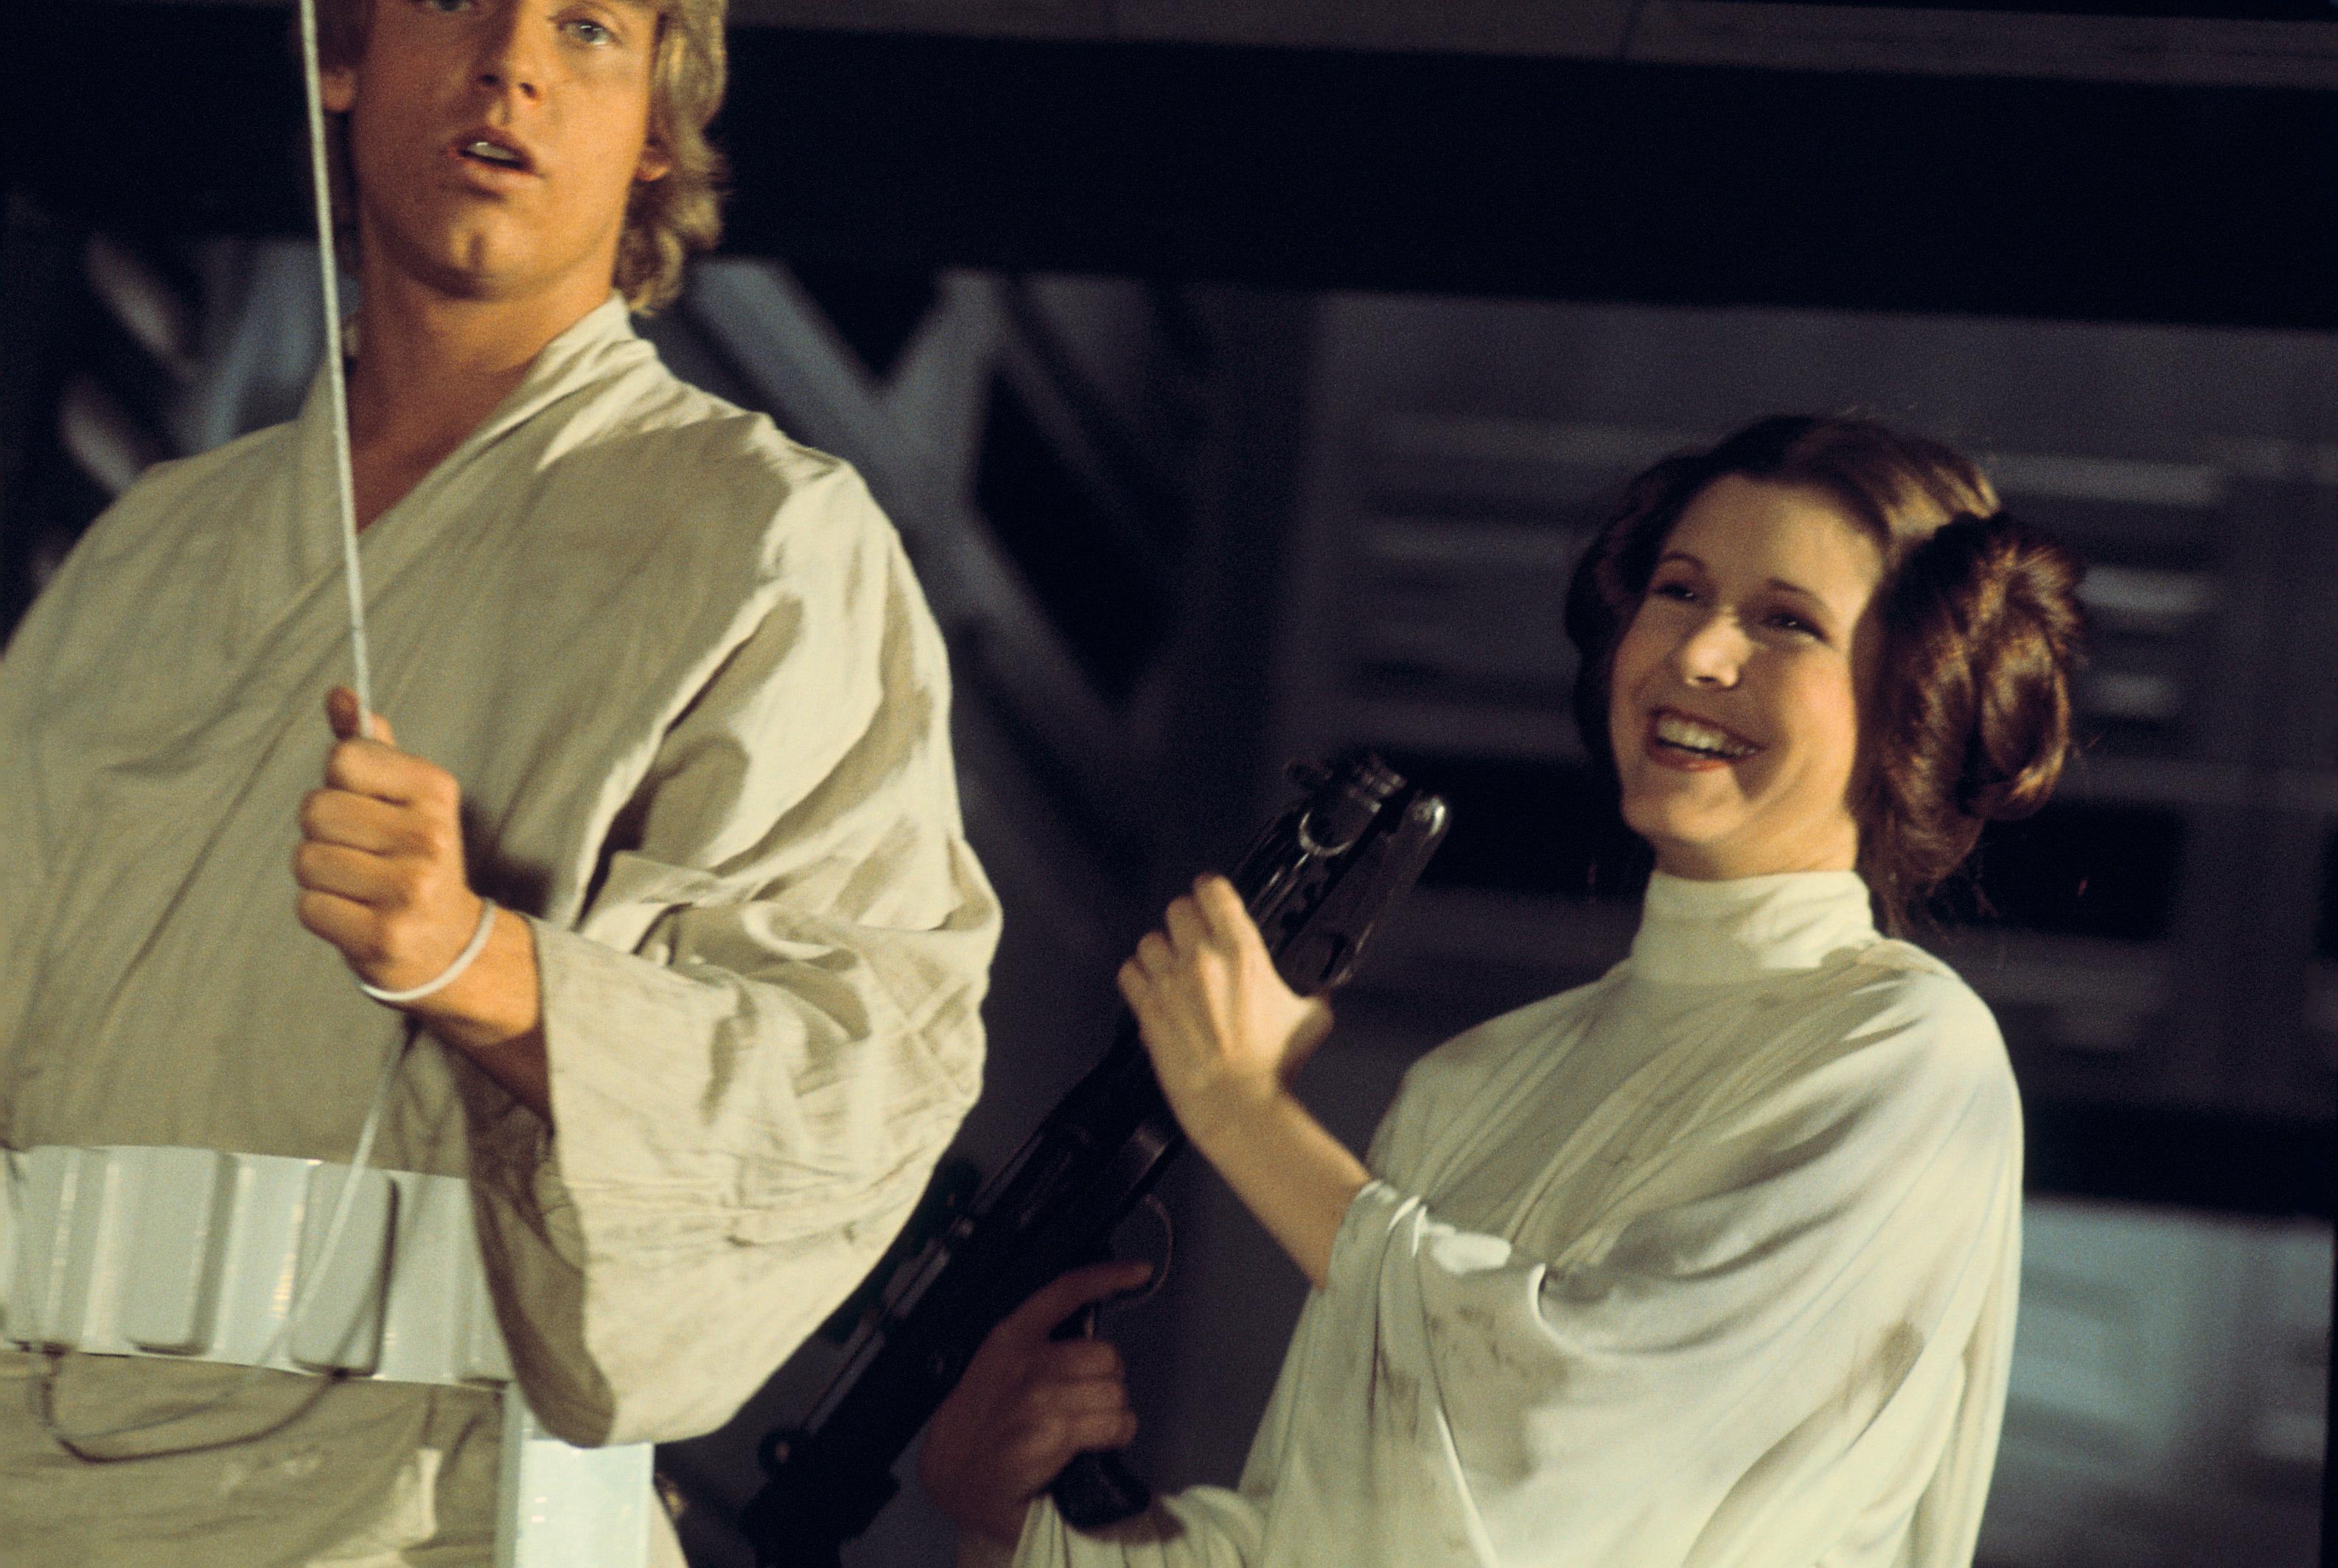 Carrie Fisher as Leia Organa